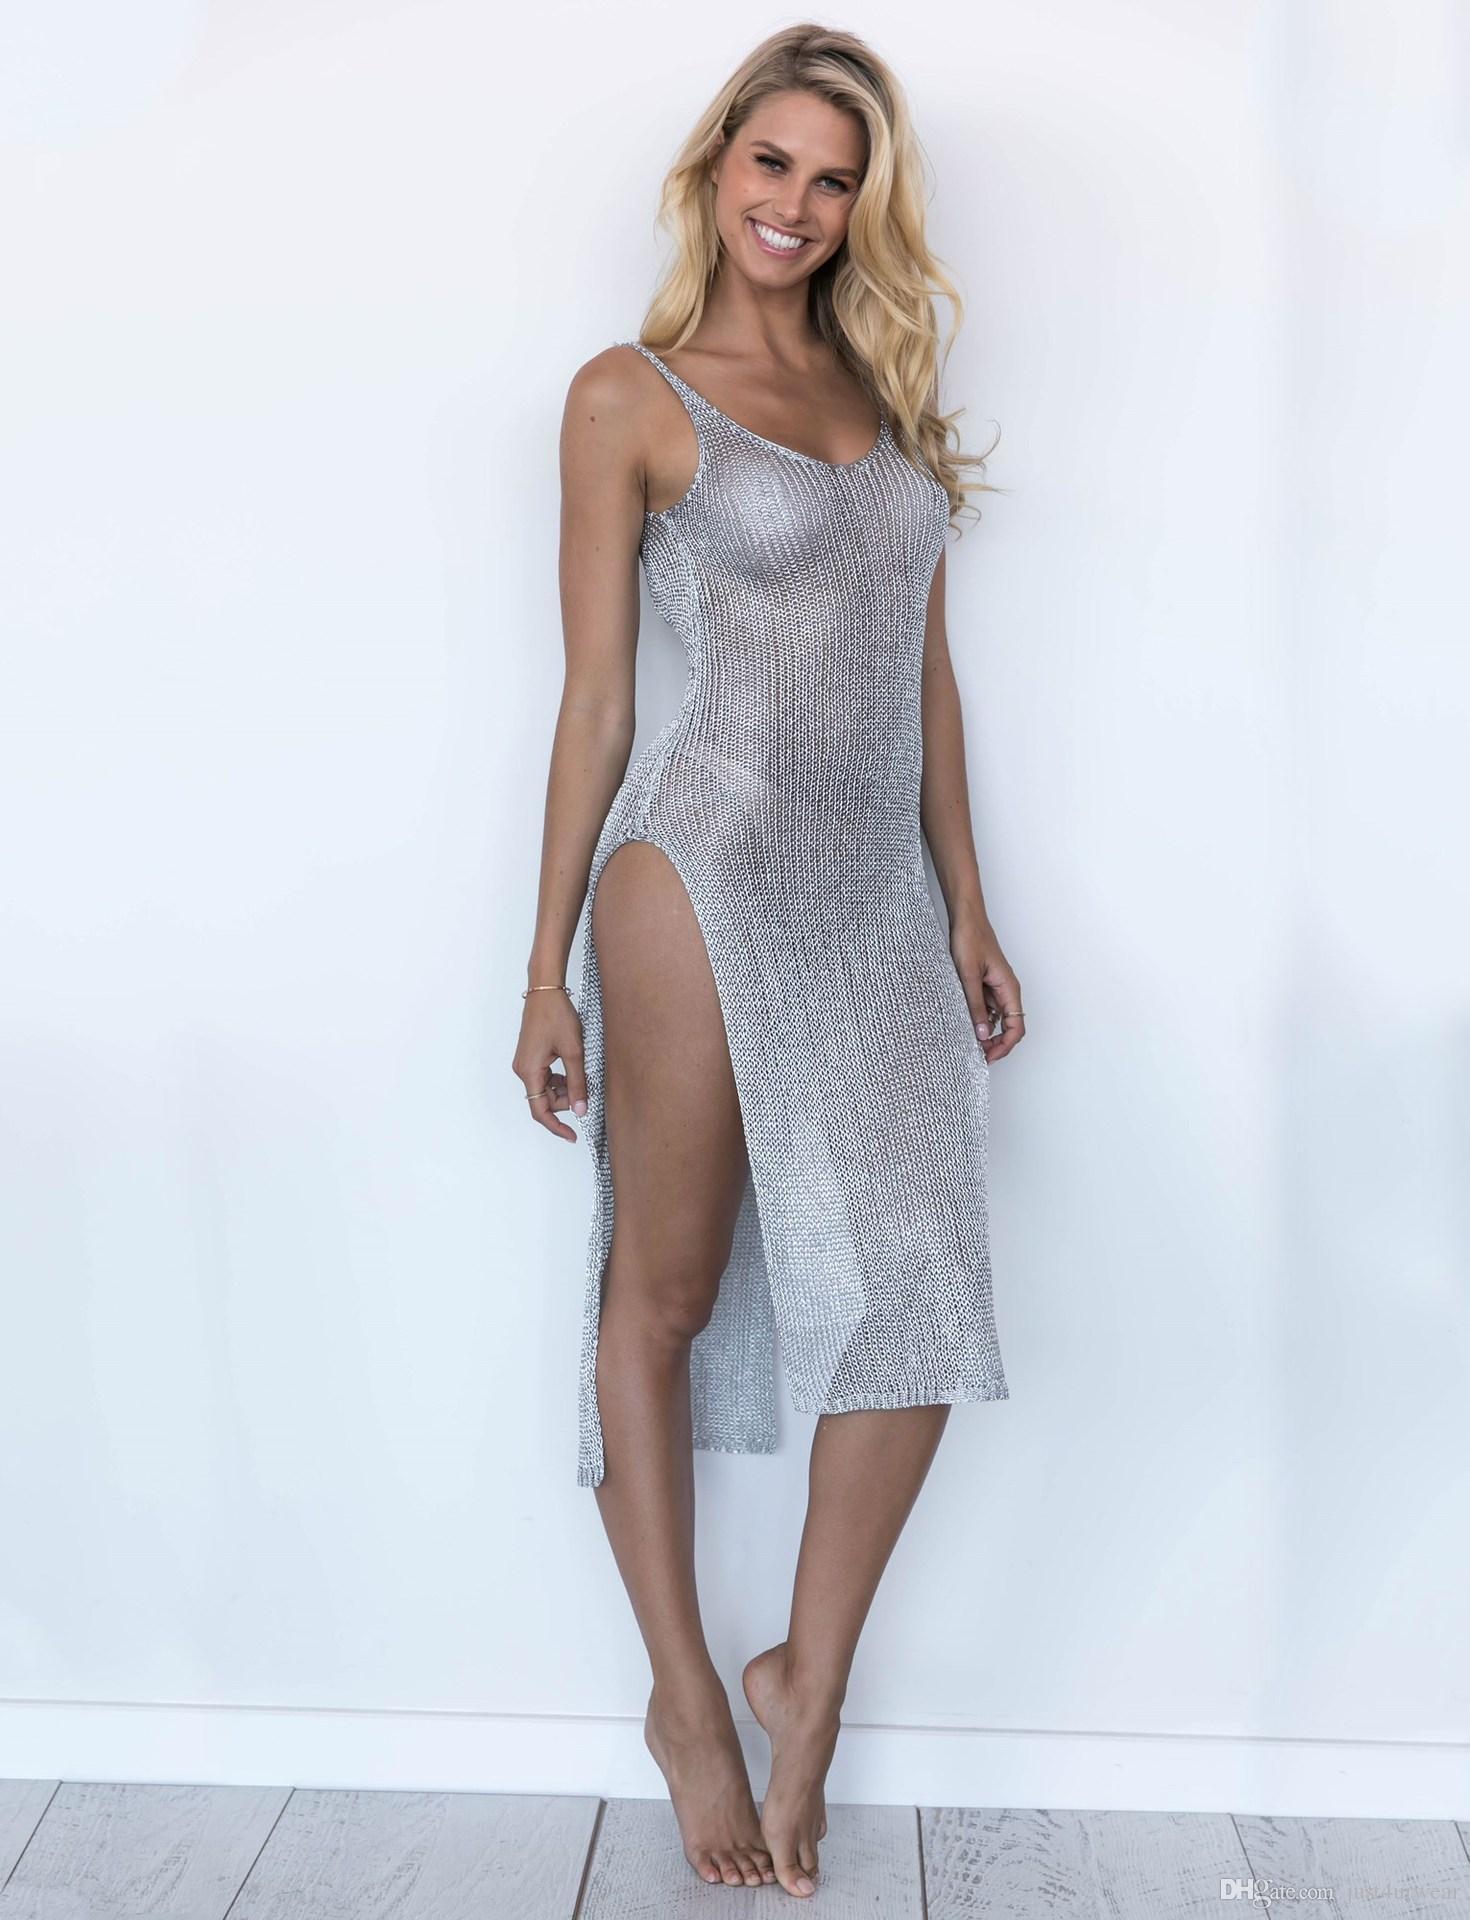 Mulheres Sexy Praia Encobrimentos Oco Out Malha Dividir Regata Longo Vestido Capa Corpo Bainha Desgaste Seaside